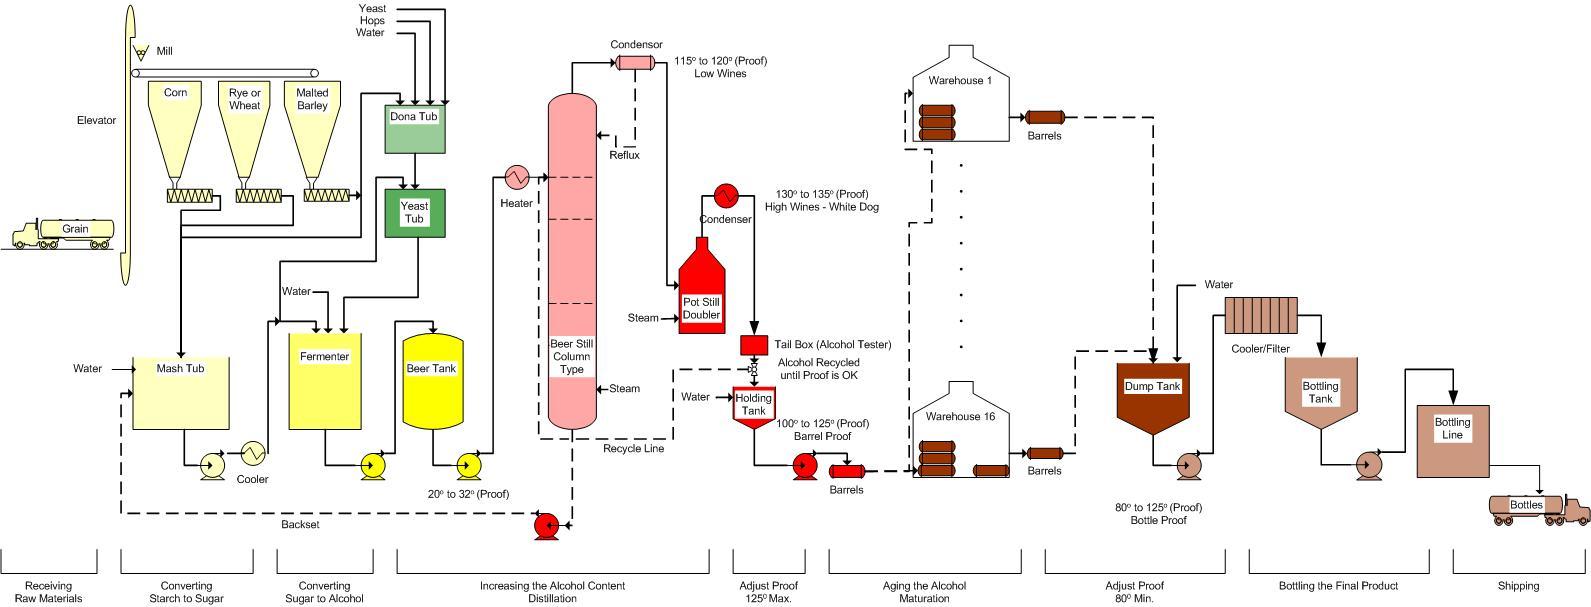 https://i2.wp.com/www.pfeiffer-history.com/Whiskey/Process%20Flow.jpg